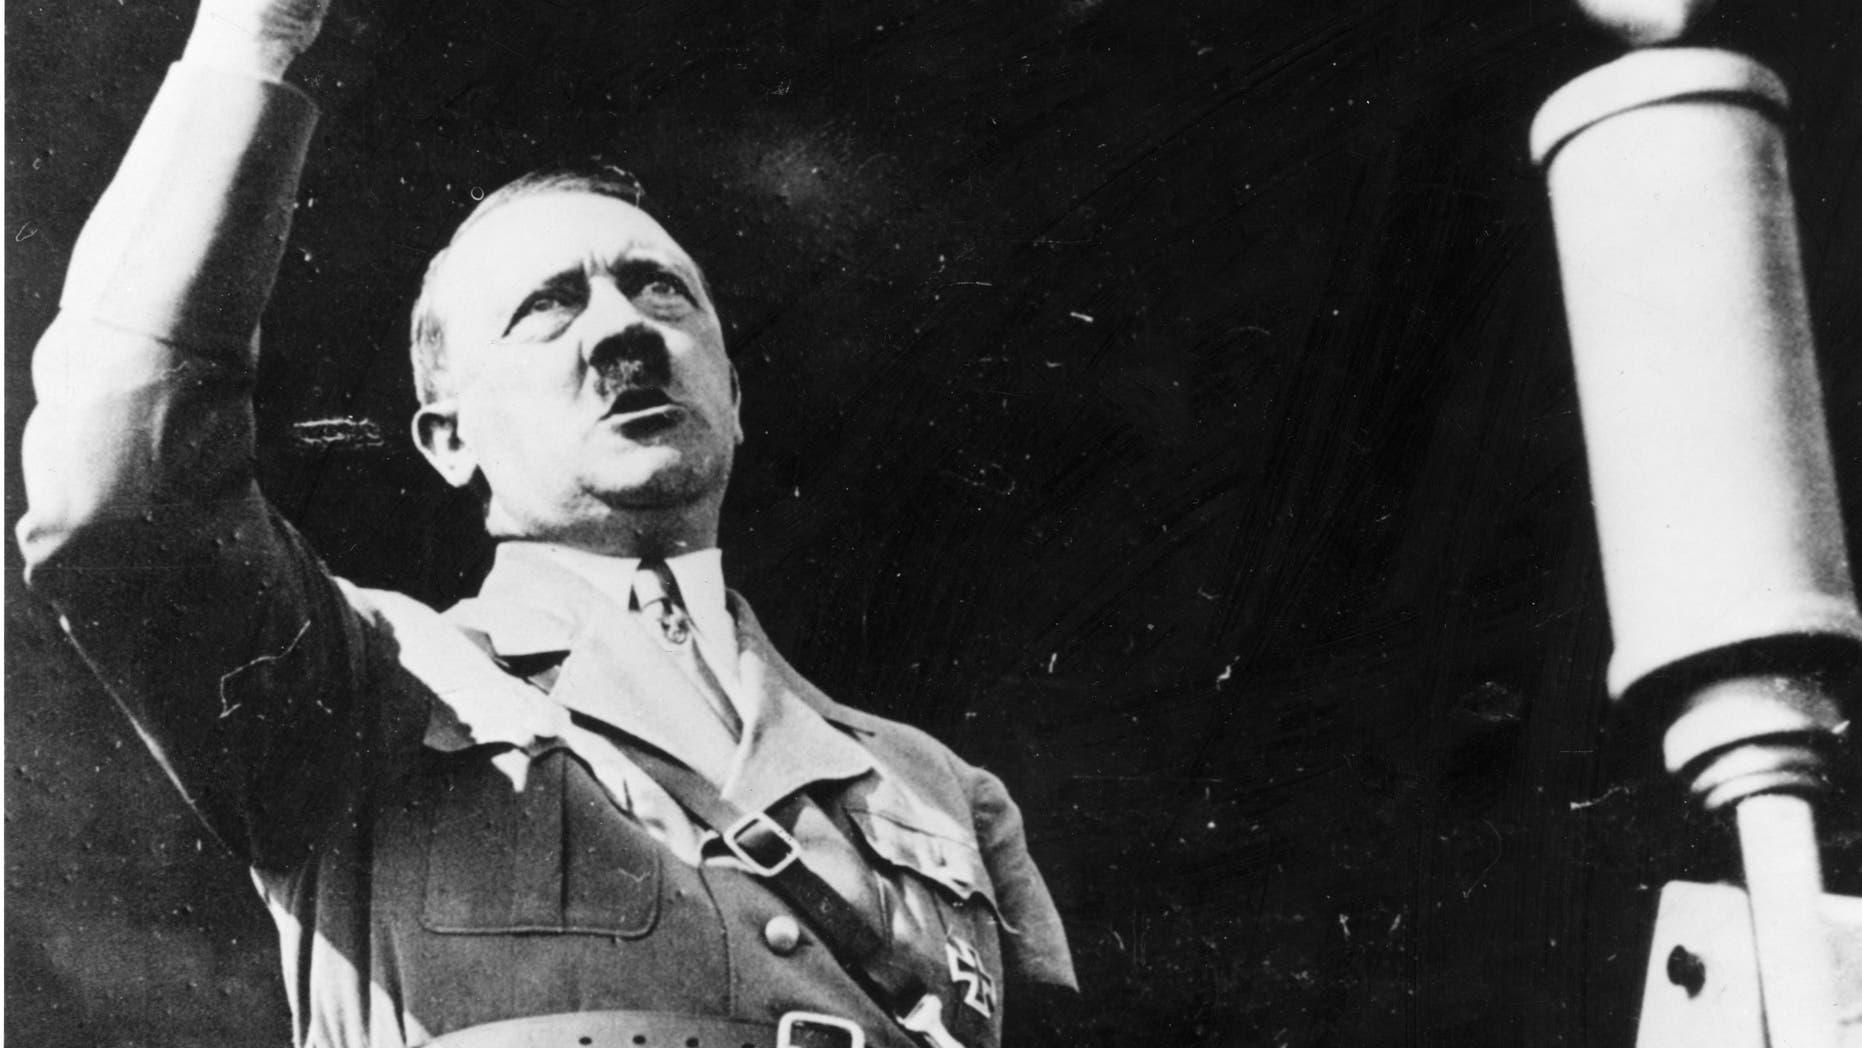 Circa 1939:  Austrian born German fascist dictator Adolf Hitler (1889 - 1945).